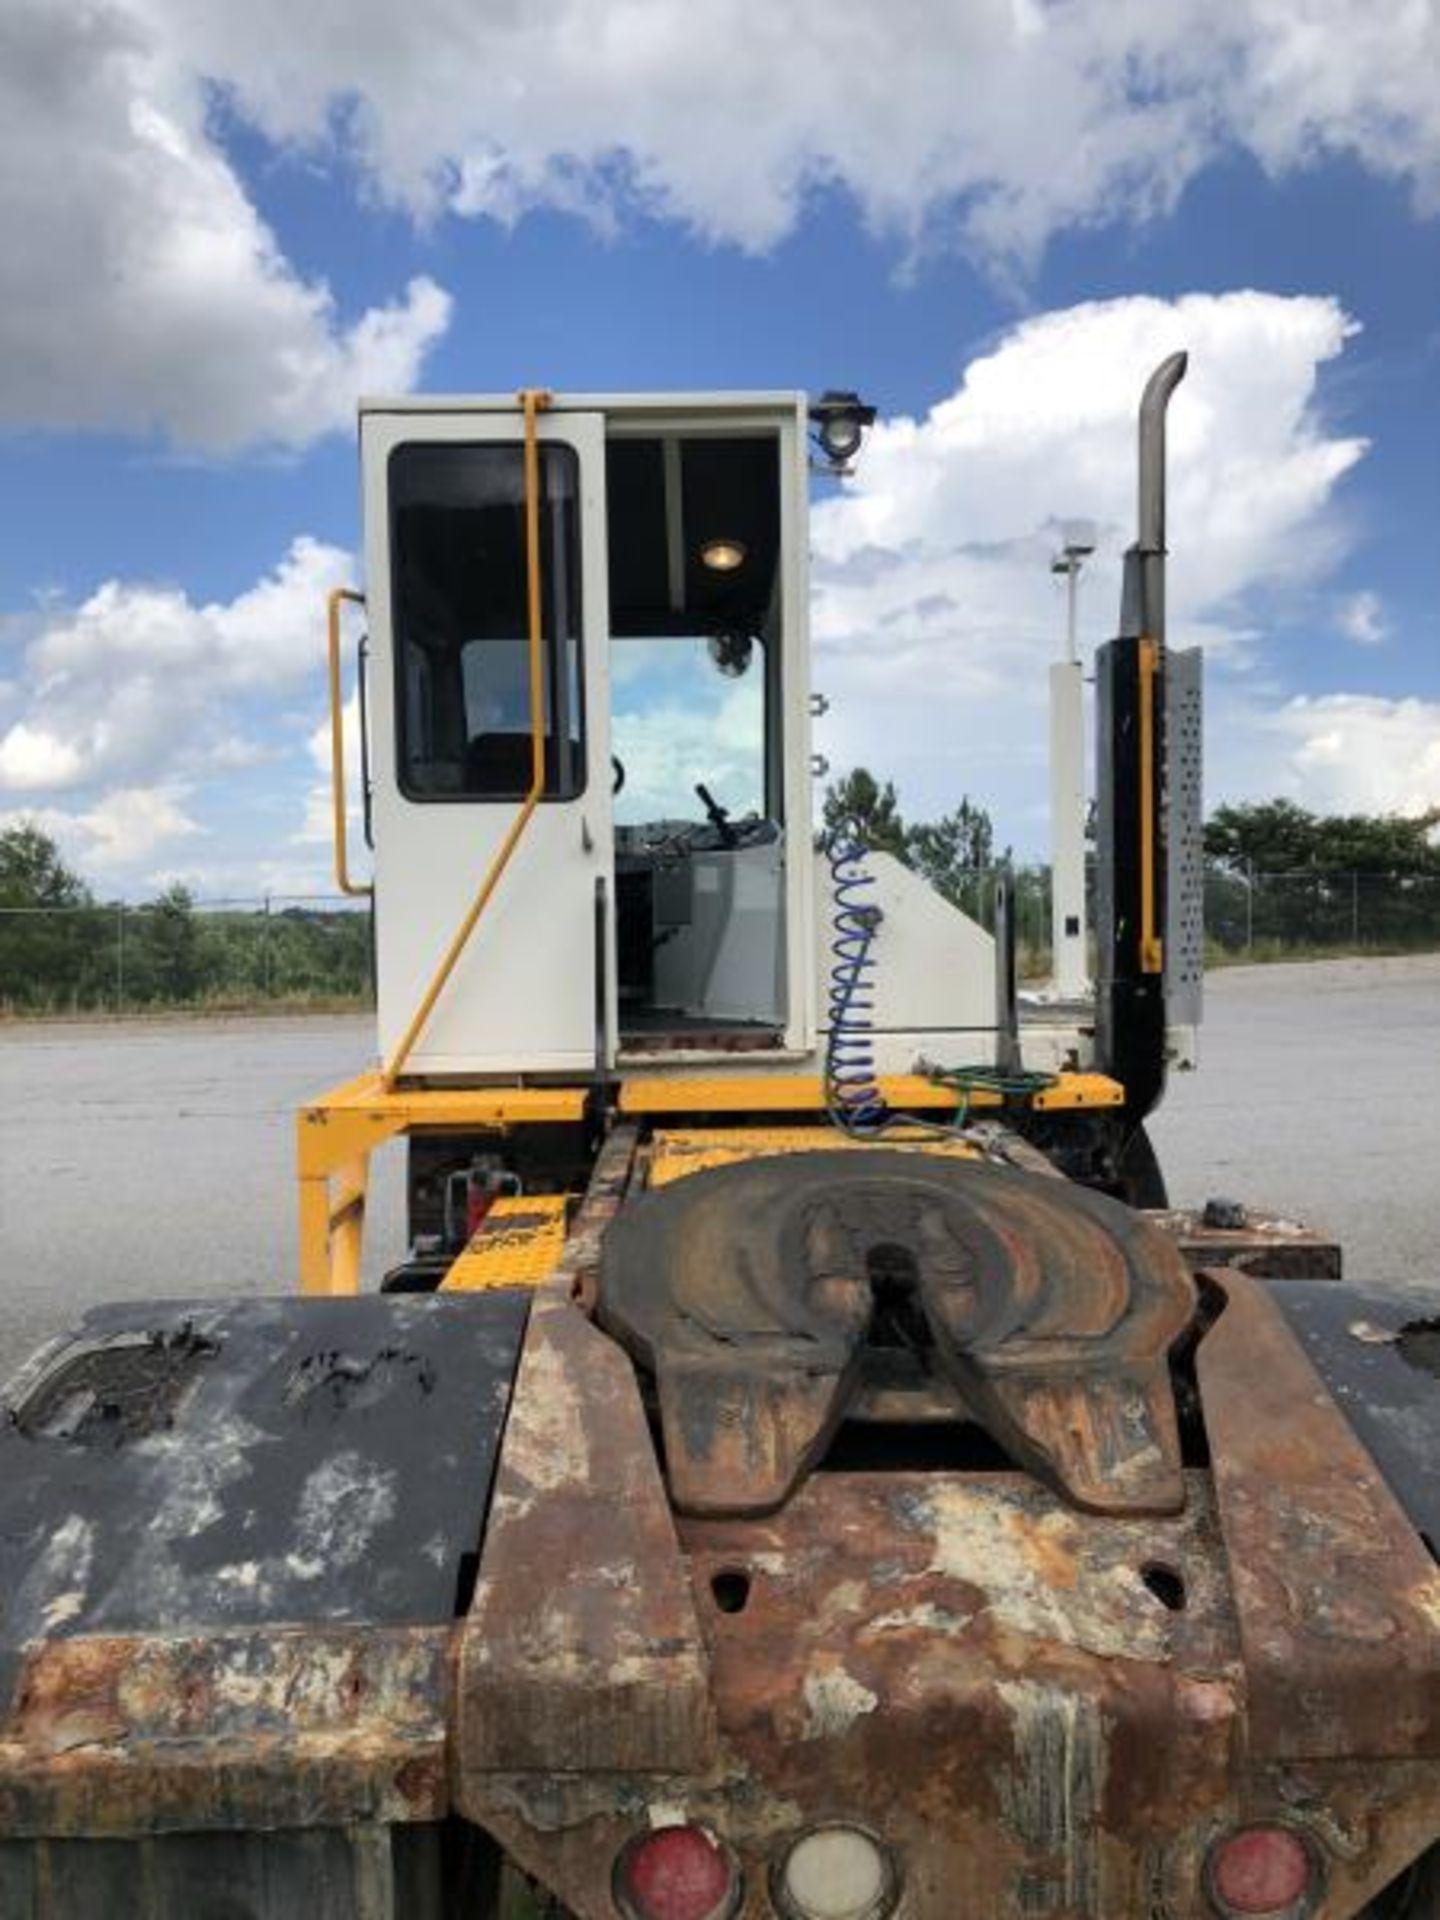 2015 Kalmar Ottawa 4x2 Yard Truck , SN: 338838 3,710.3 Hours, 2,817 Miles - Image 20 of 28